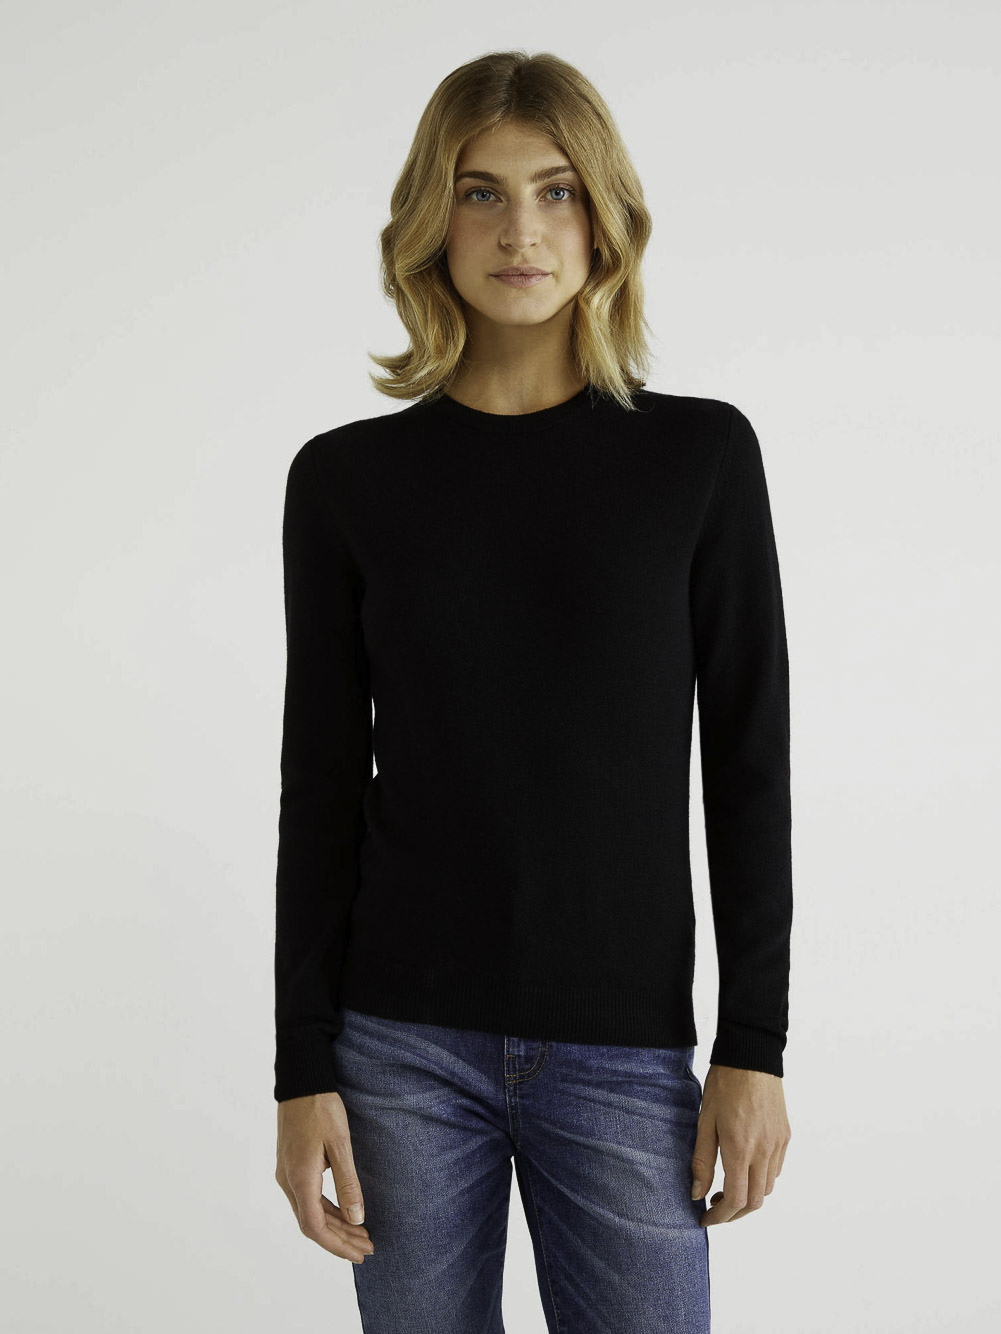 BENETTON Μπλούζα με λαιμόκοψη 100% παρθένο μαλλί 1002D1K01 20A100